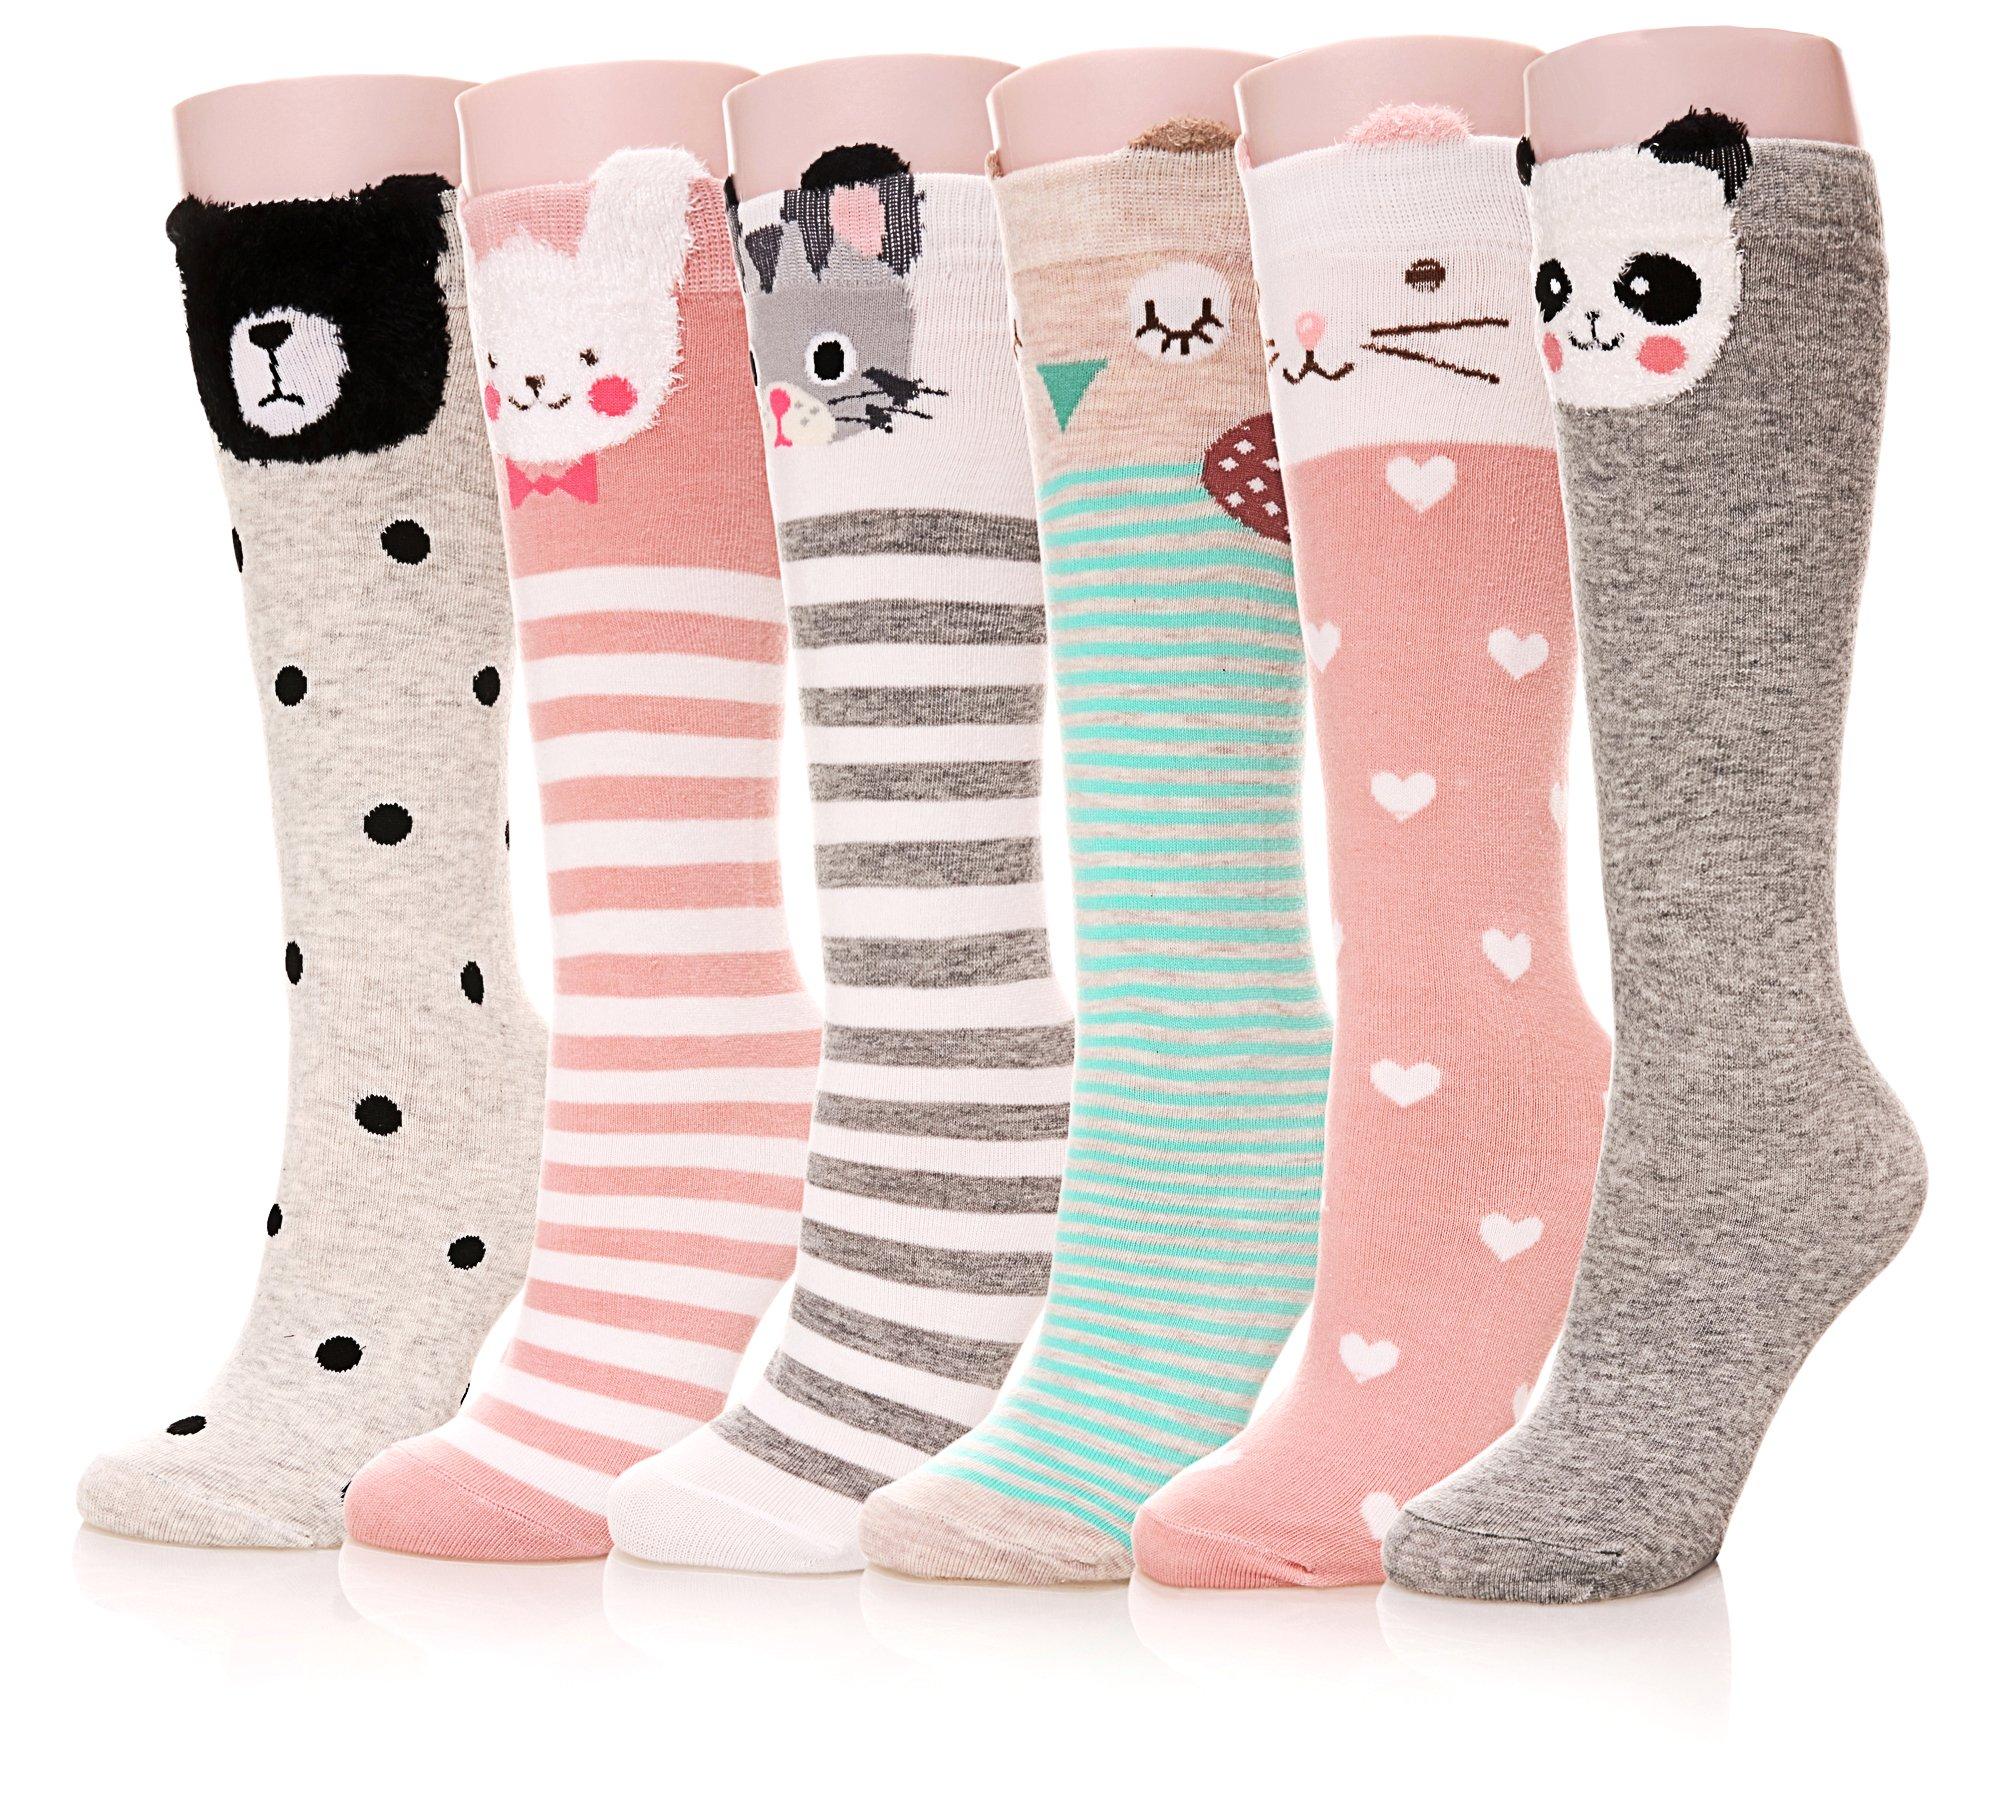 Color City Kids Girls Socks Knee High Stockings Cartoon Animal Theme Cotton Socks (6 Pairs) by Color City (Image #1)